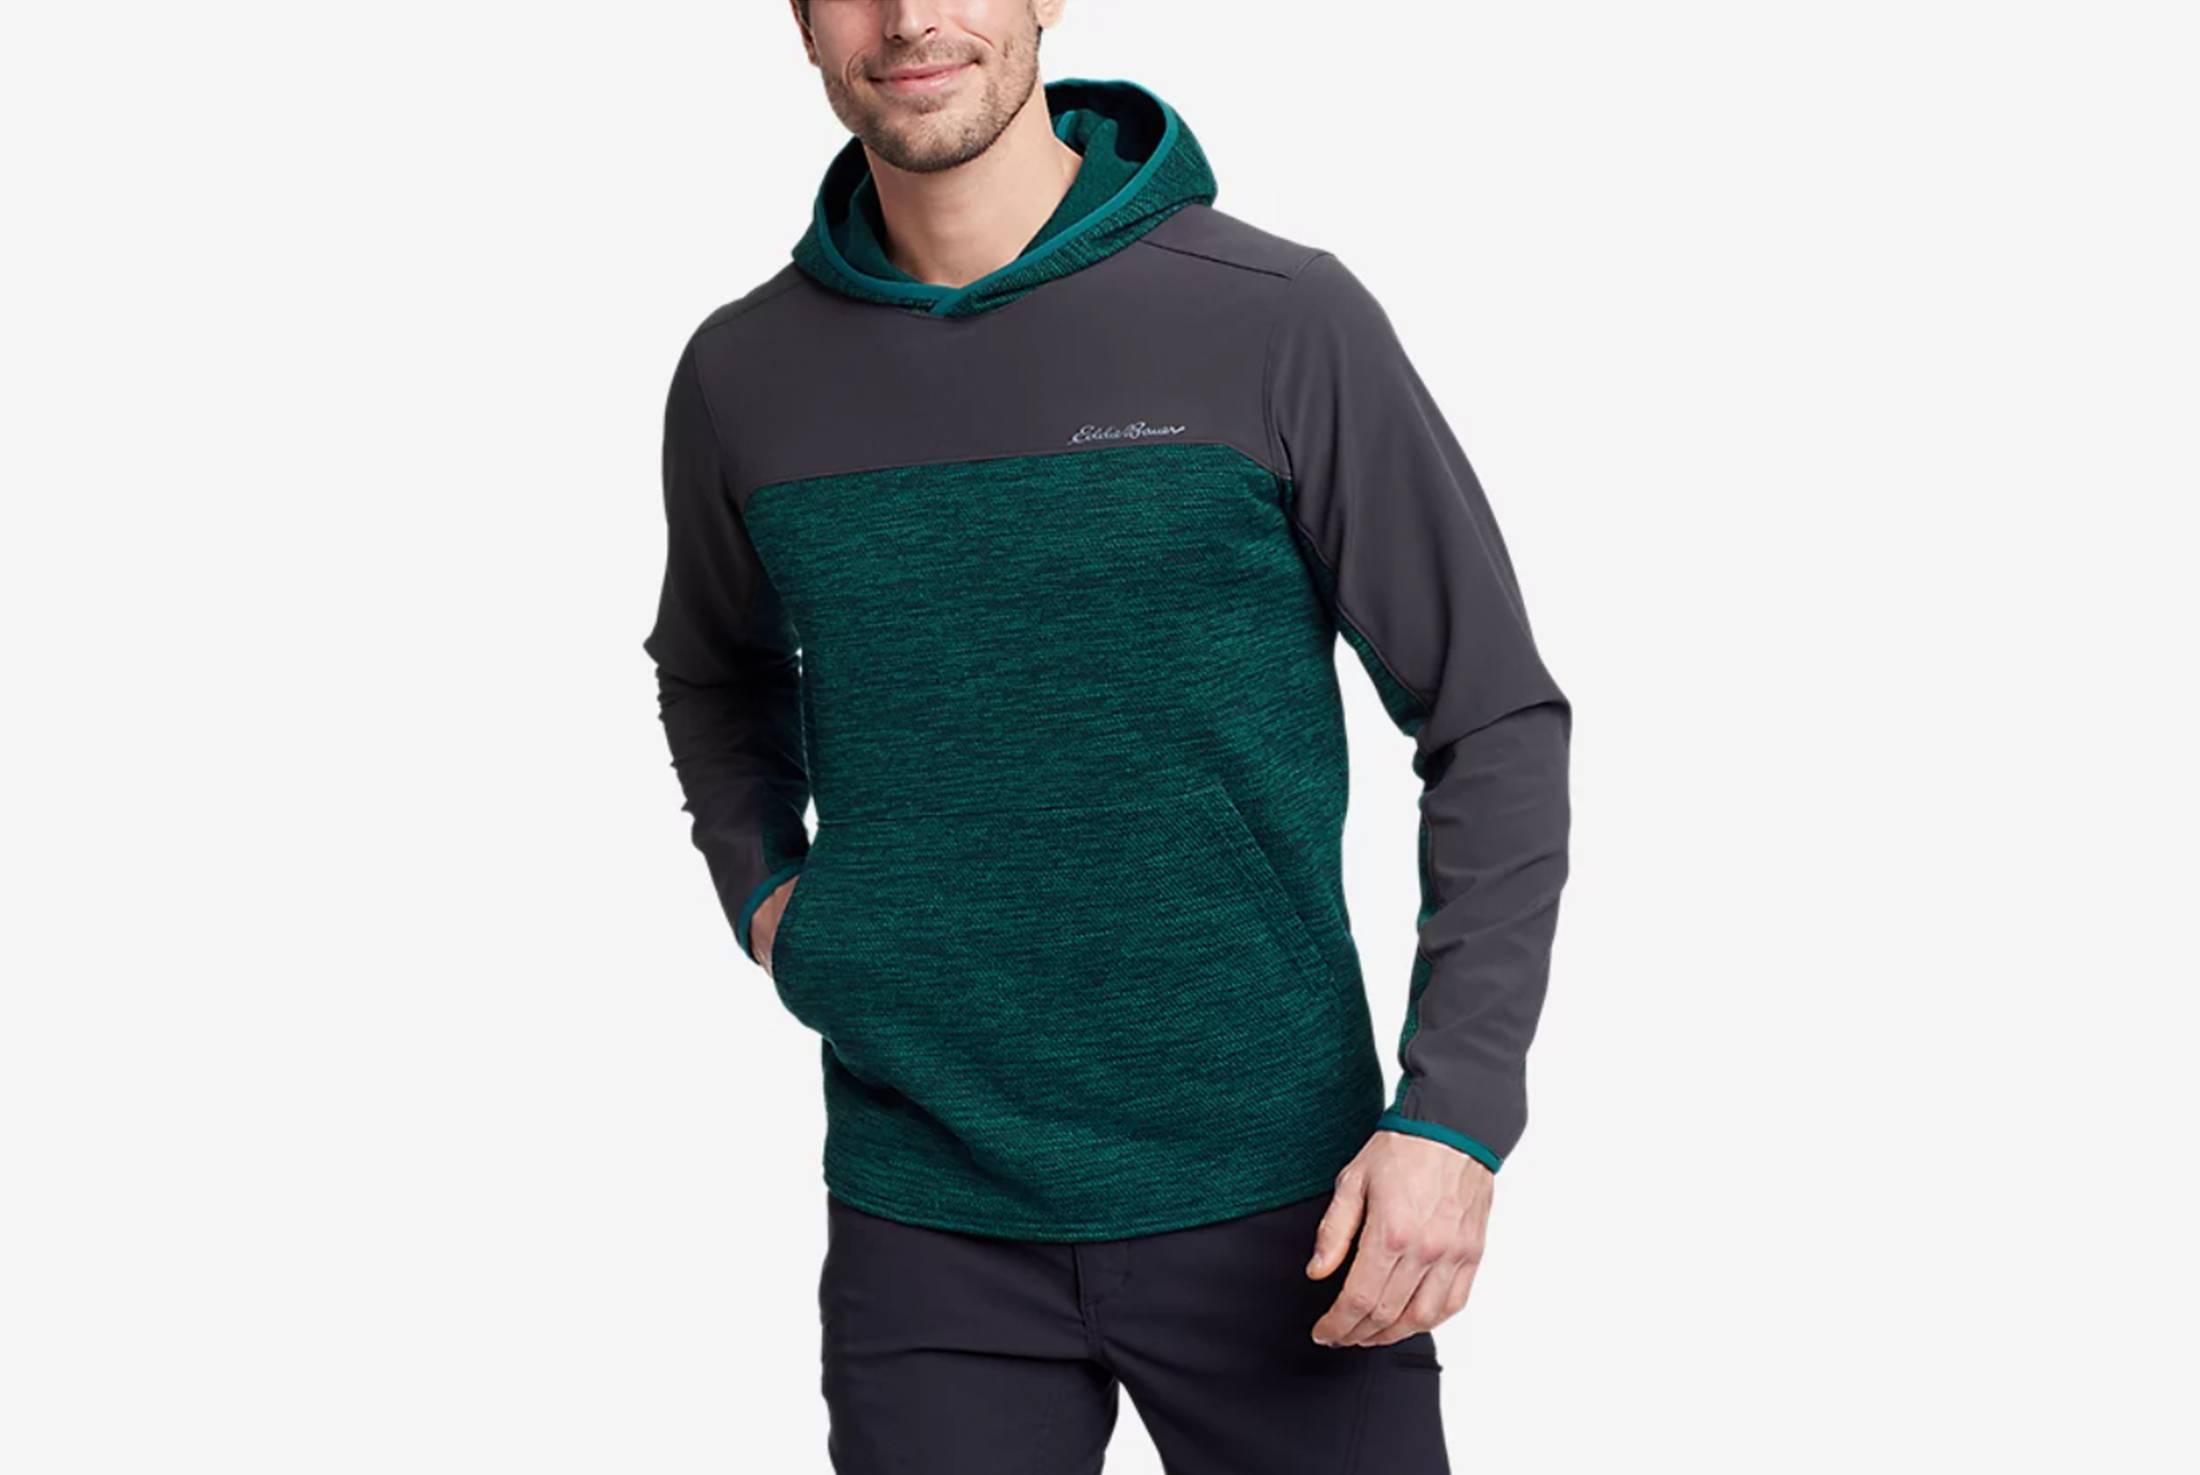 Eddie Bauer on the Run hoodie